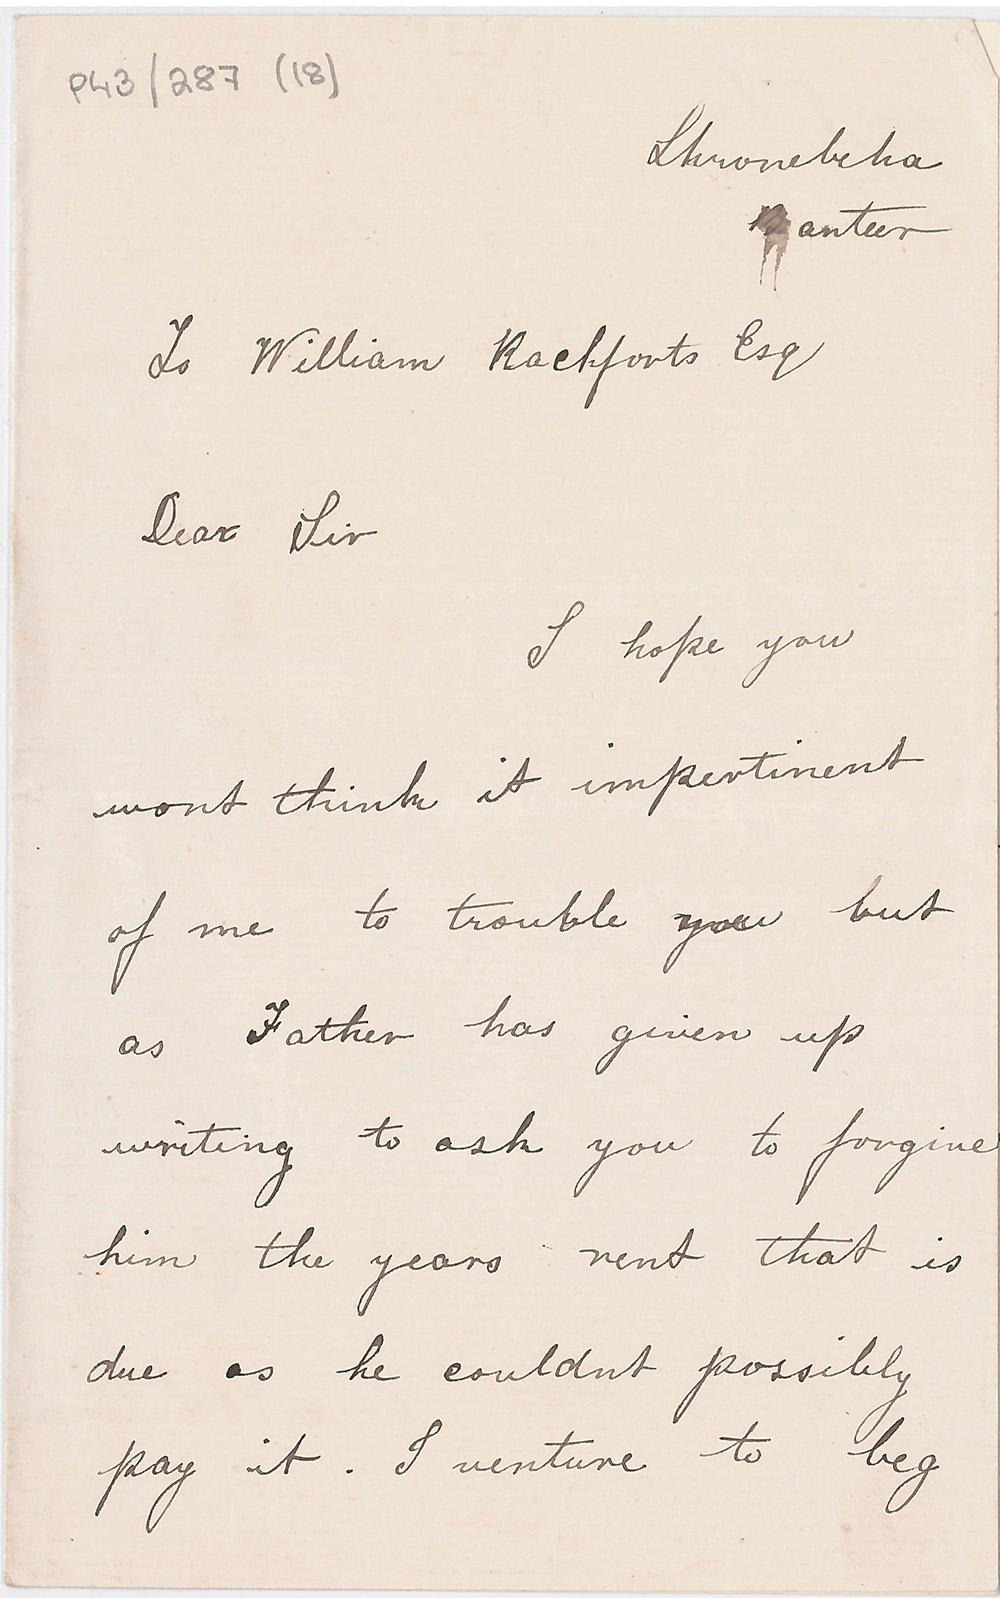 Handwritten letter from Nora O'Sullivan to William Rochfort